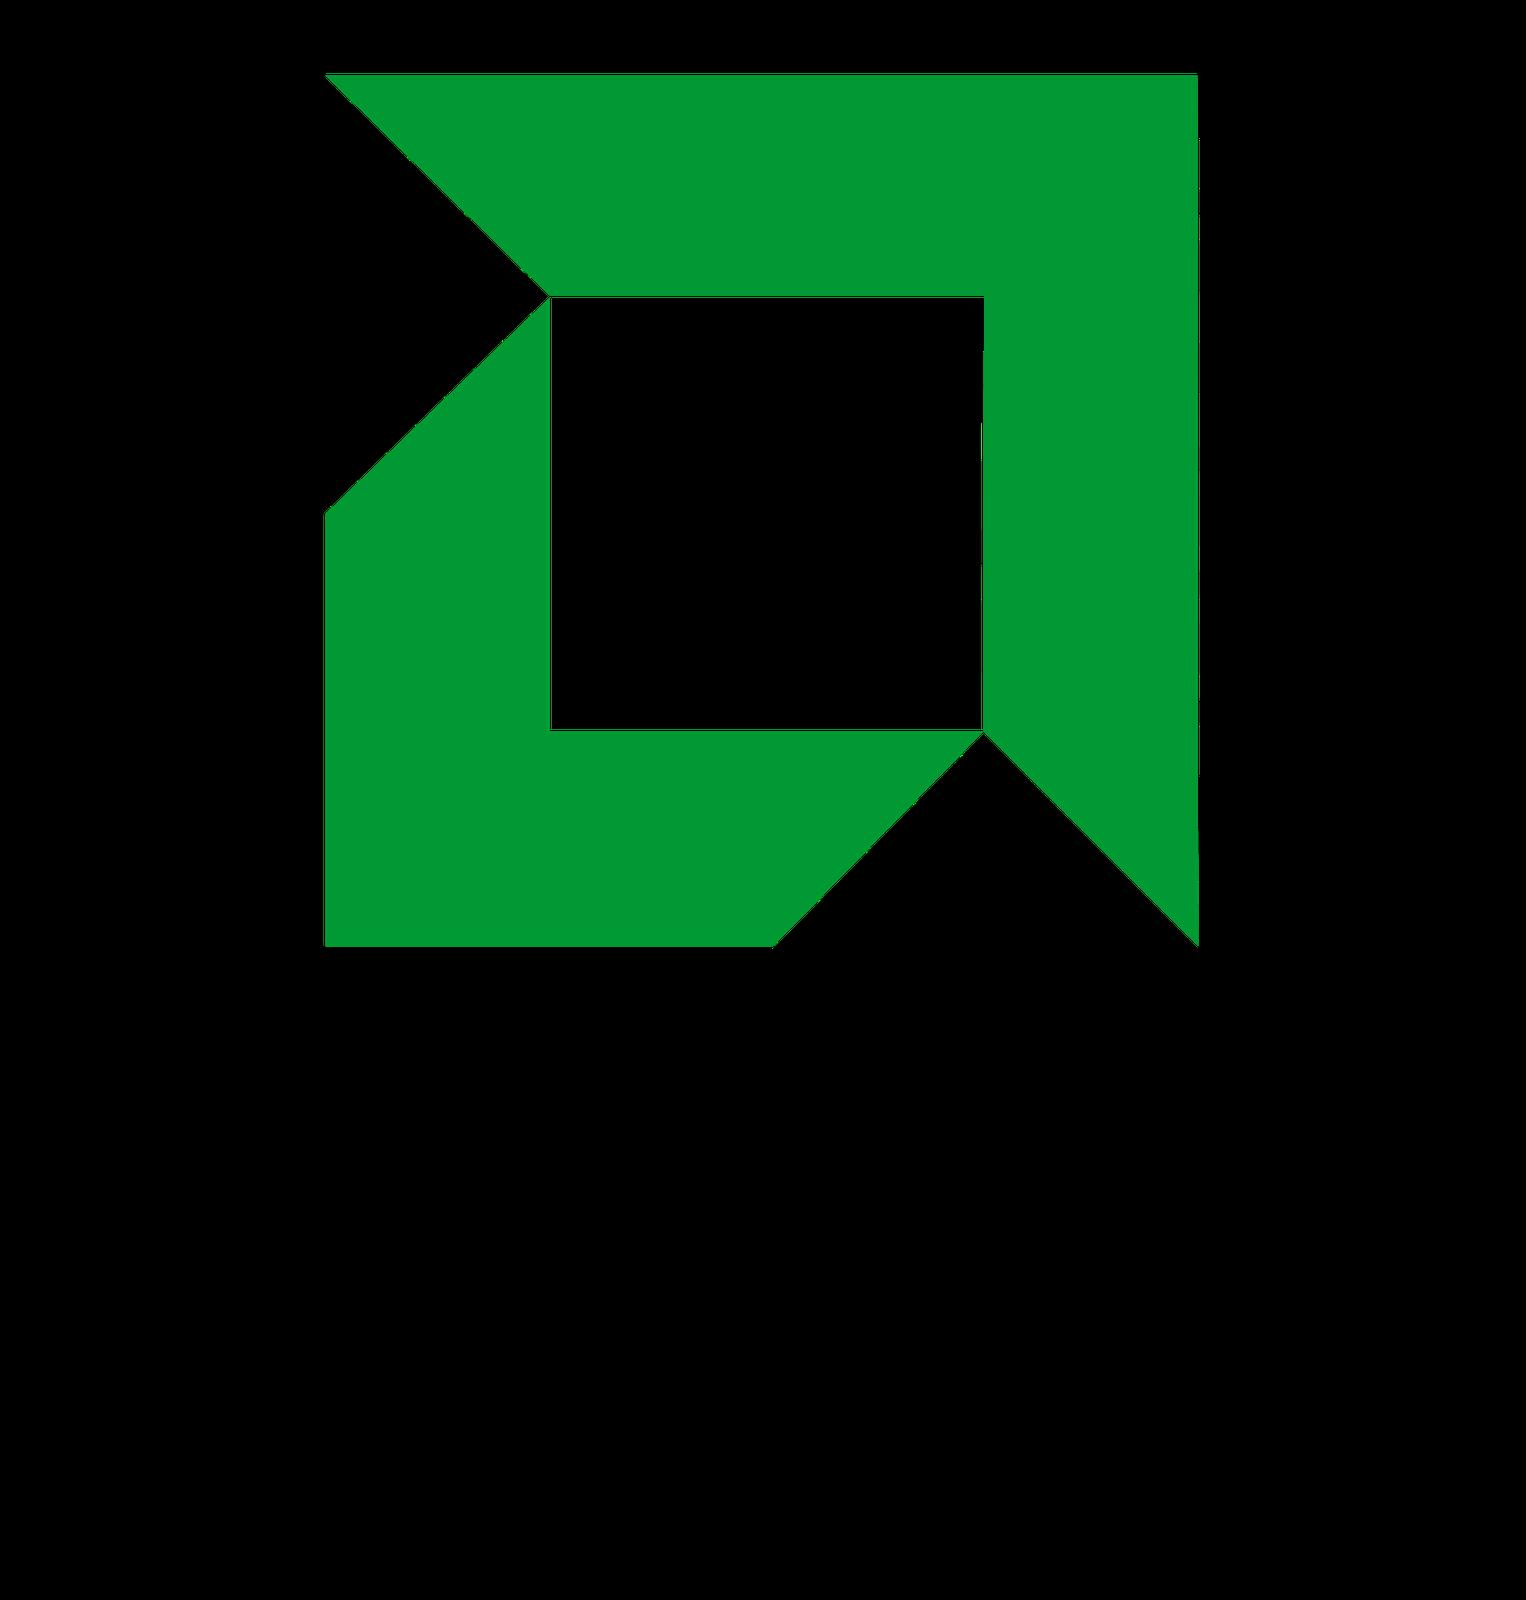 AMD symbol wallpapers HD